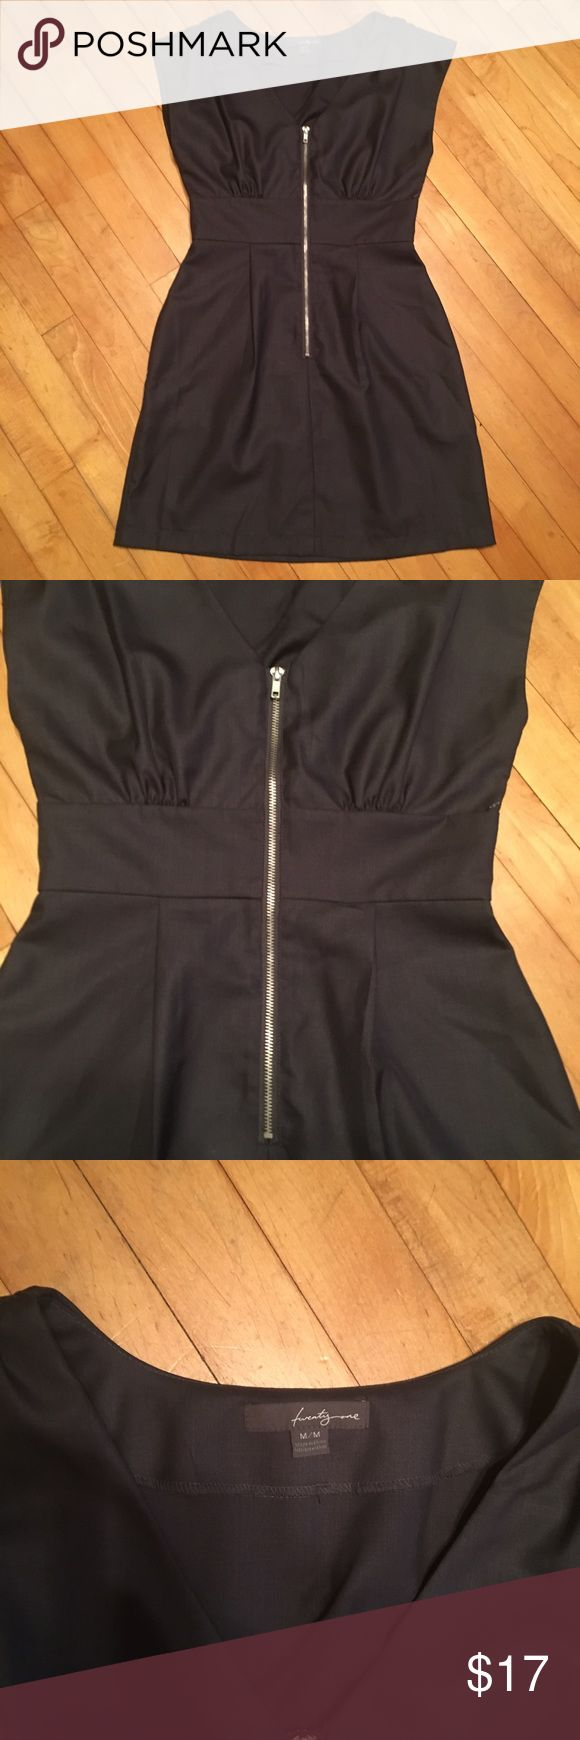 Zipper front deep navy mini dress Deep navy with slight sheen, zipper front mini dress with banded waist. Cap sleeves. Size is Medium. TwentyOne Dresses Mini